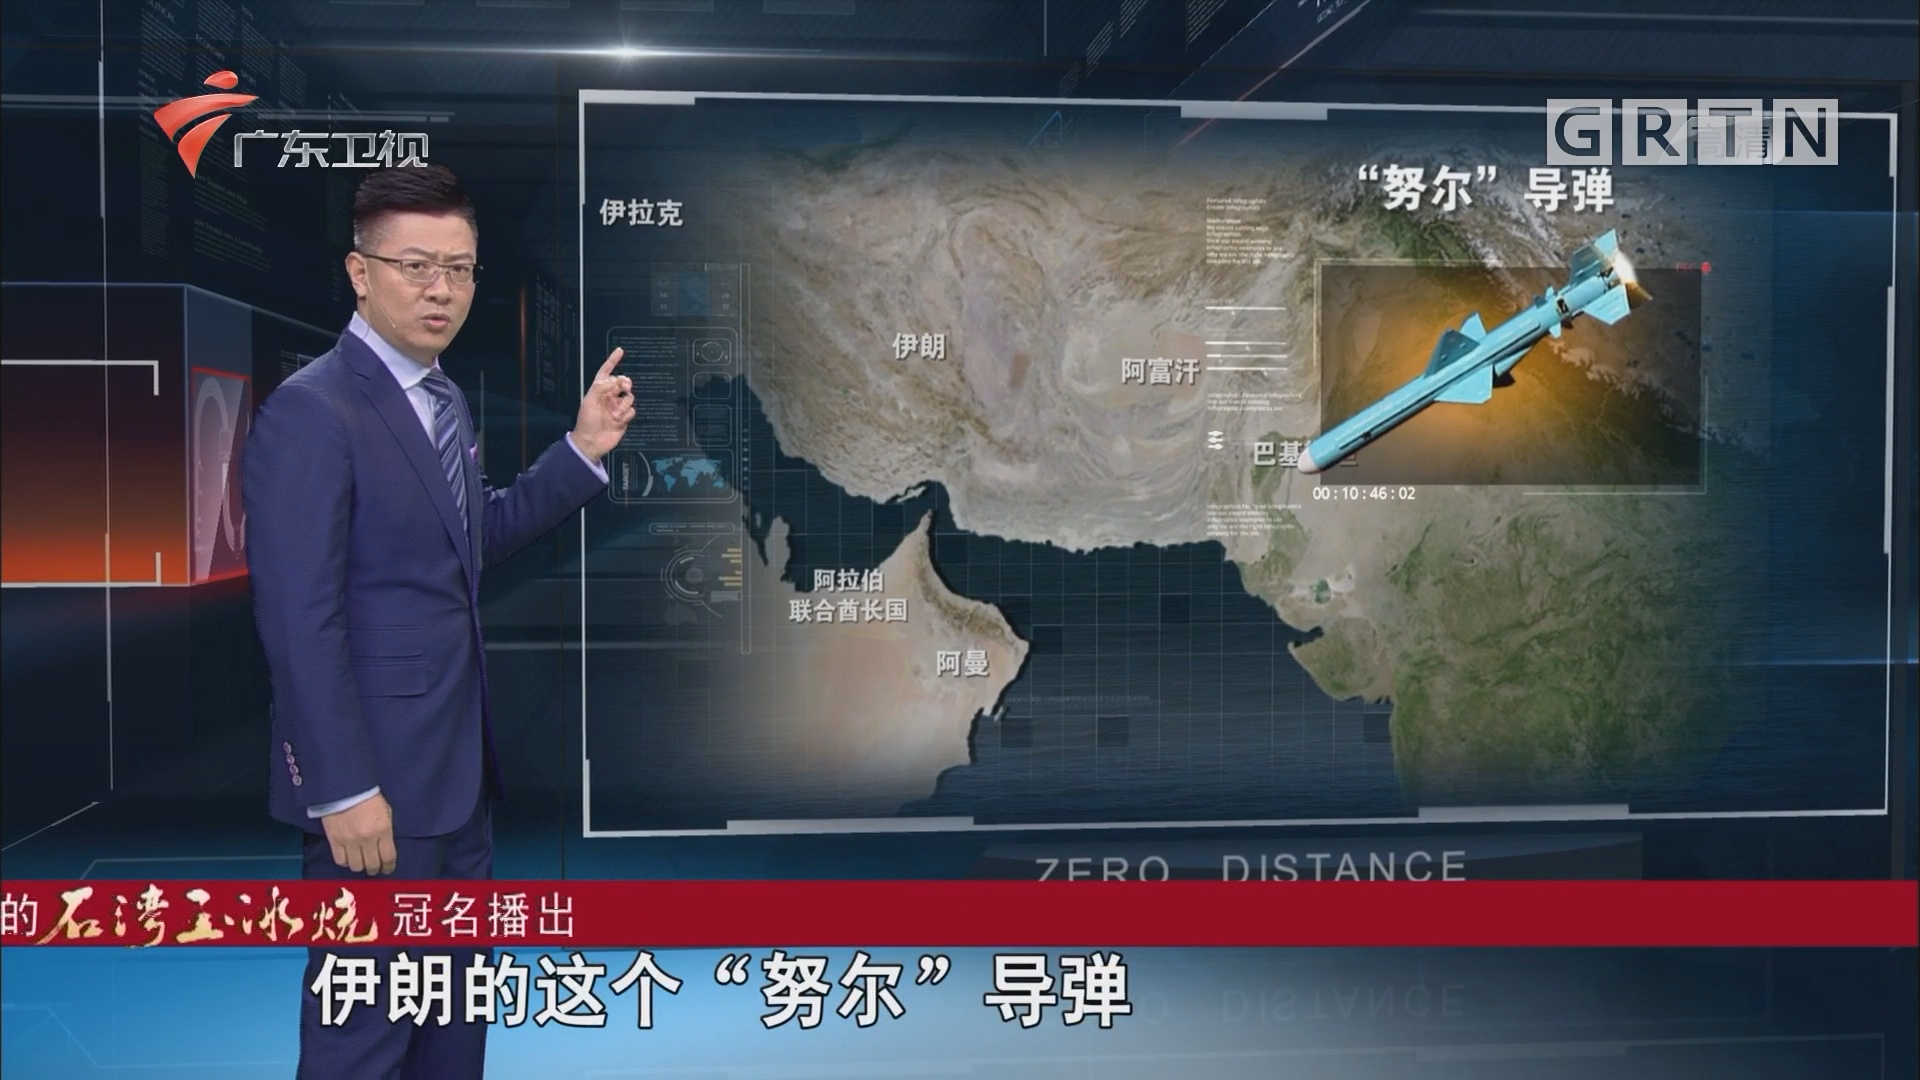 [HD][2018-08-12]全球零距离:美伊对抗再升级